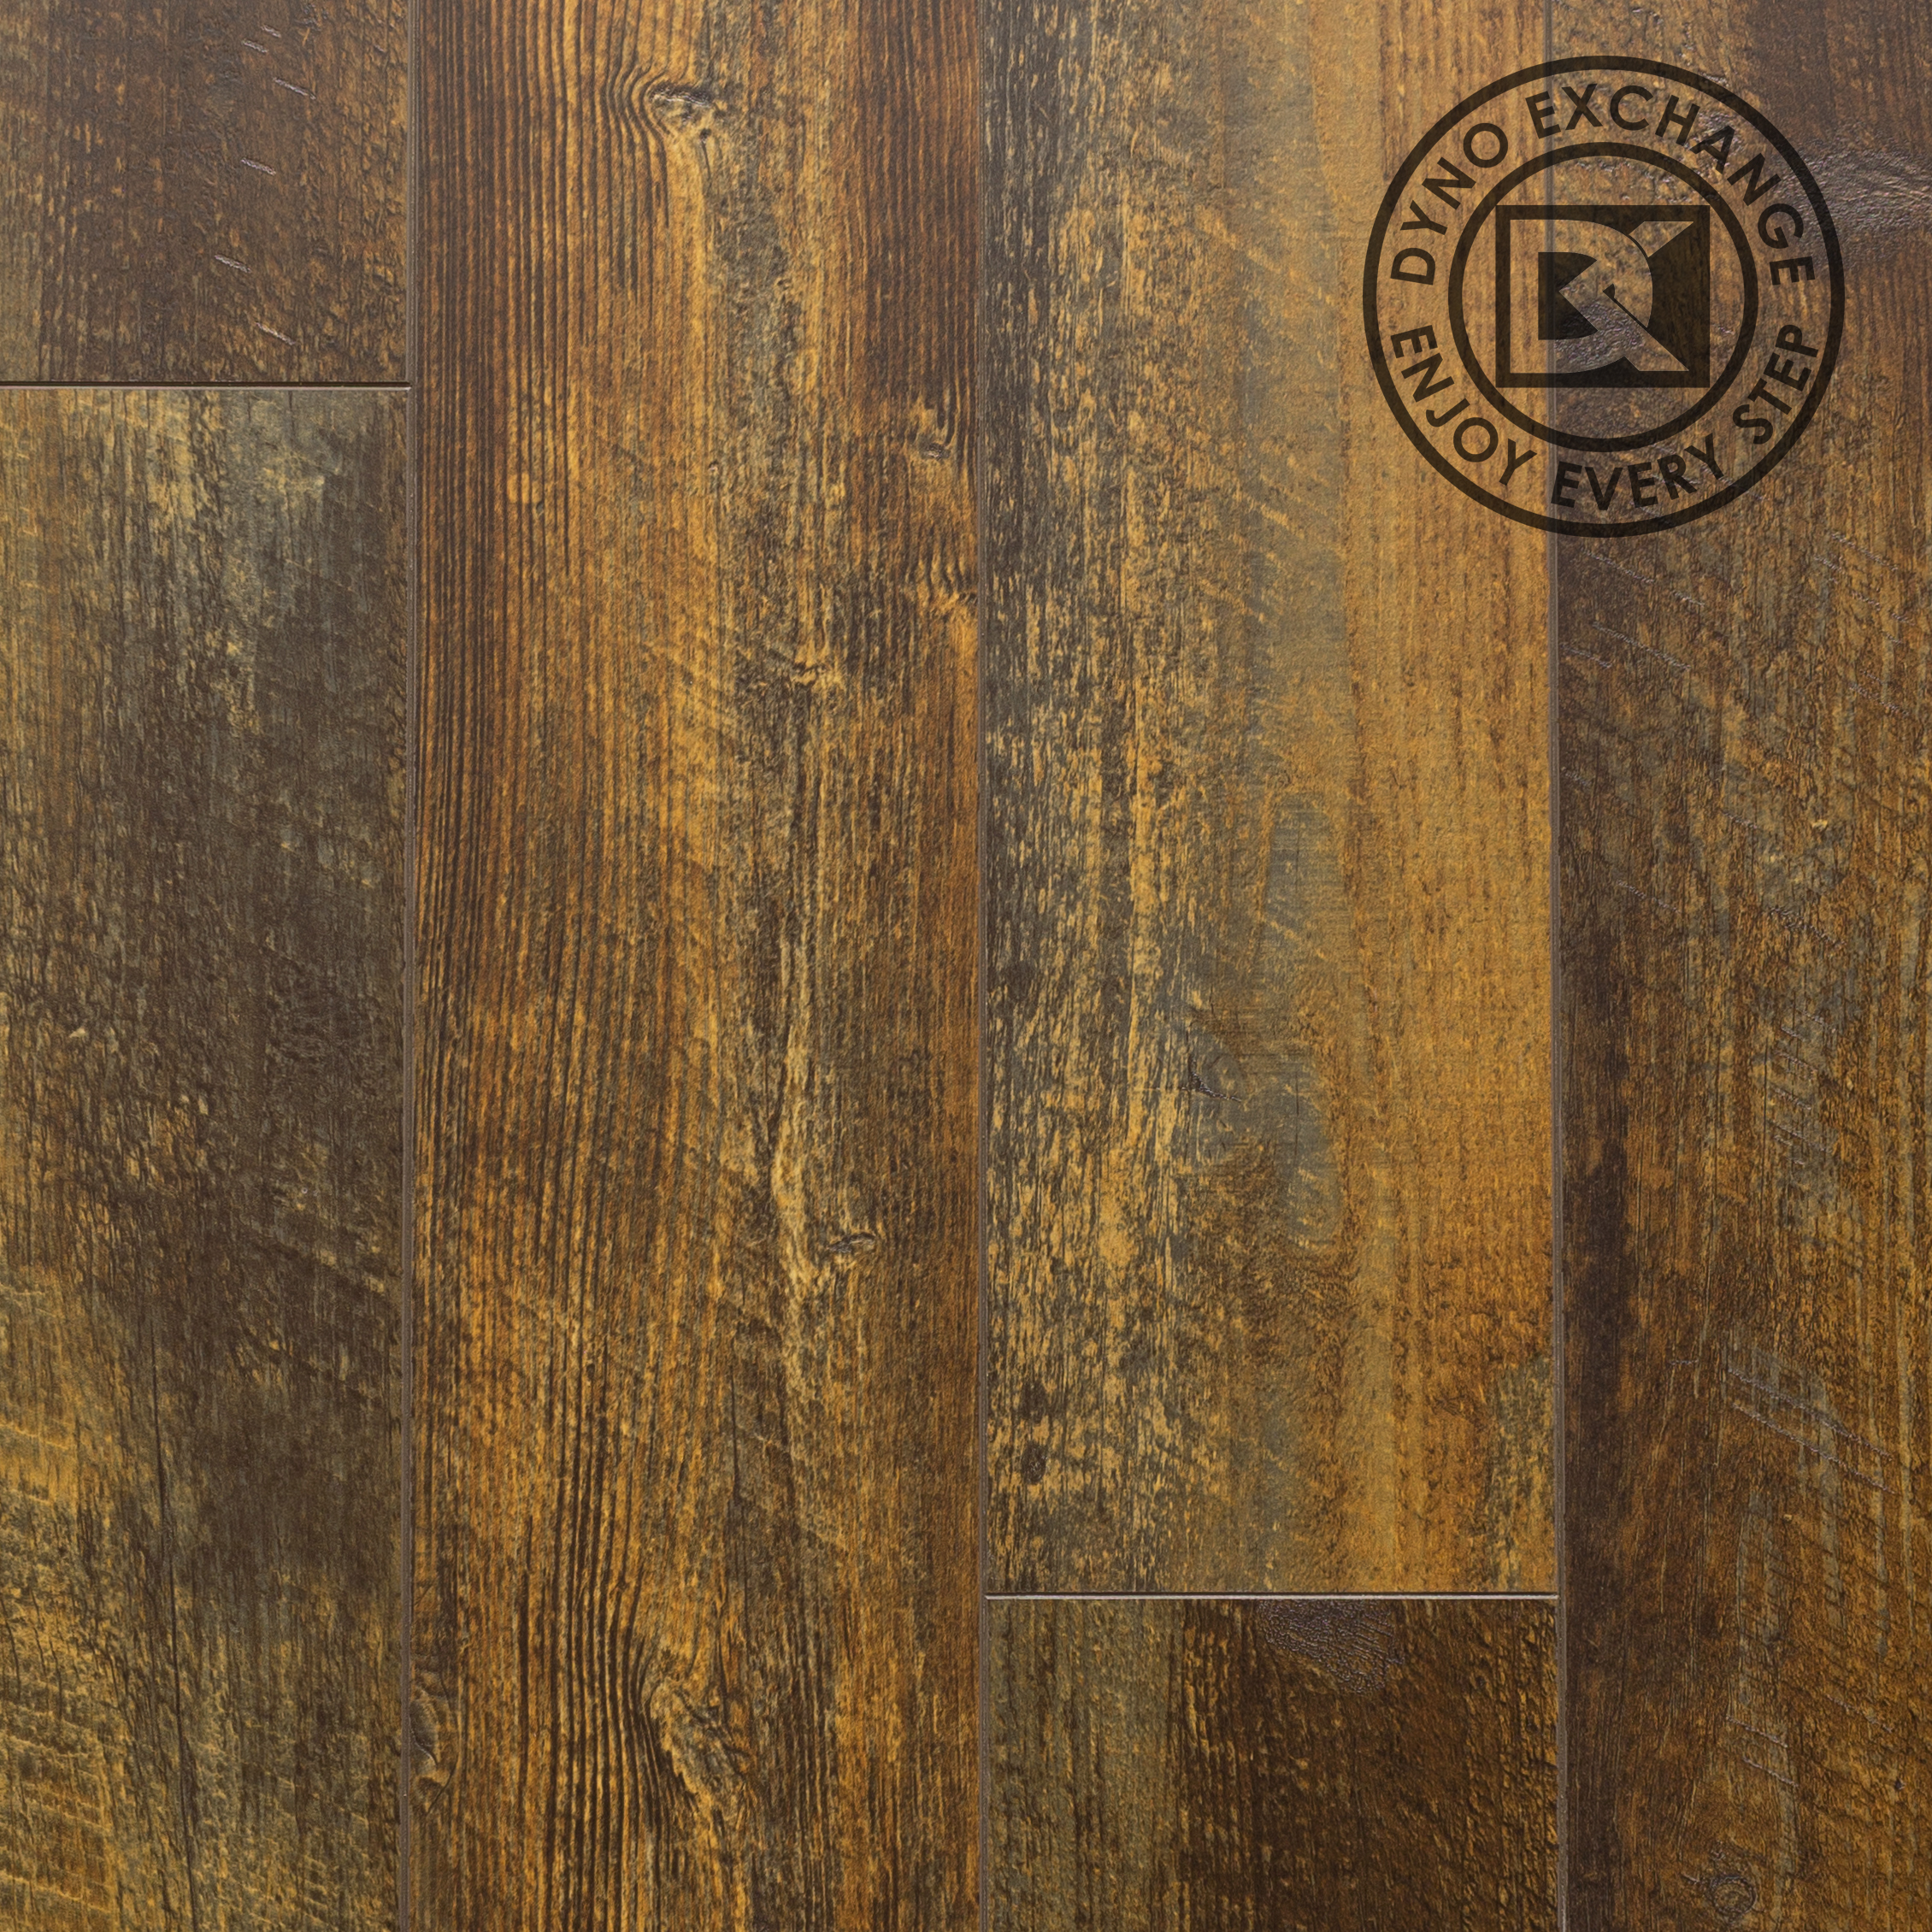 Dyno Exchange, Signature Collection Laminate Flooring, Gunstock Walnut (14.83 sqft/box)